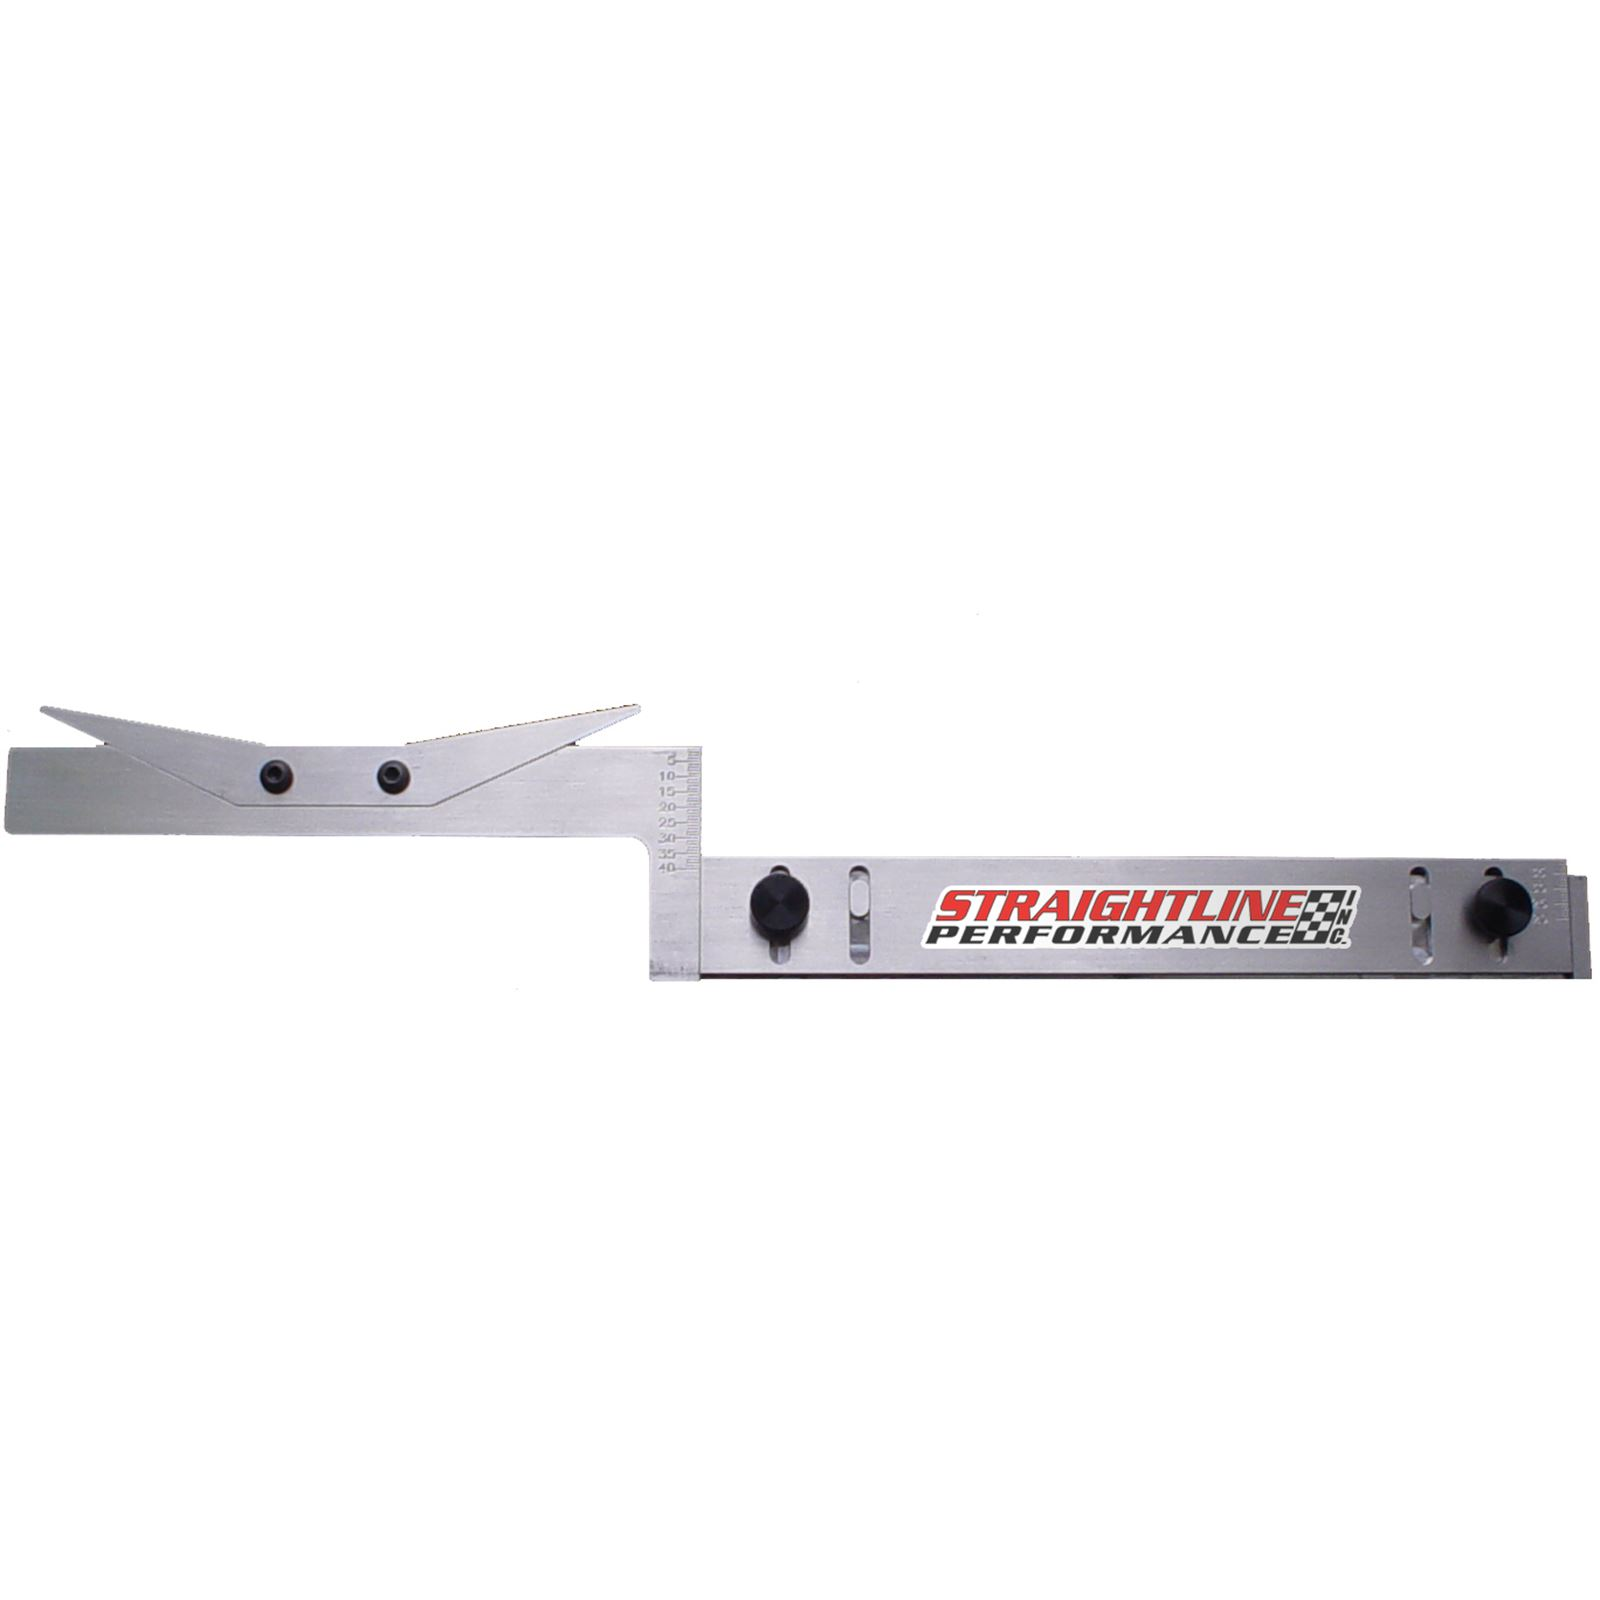 Straightline Clutch Alignment Tool